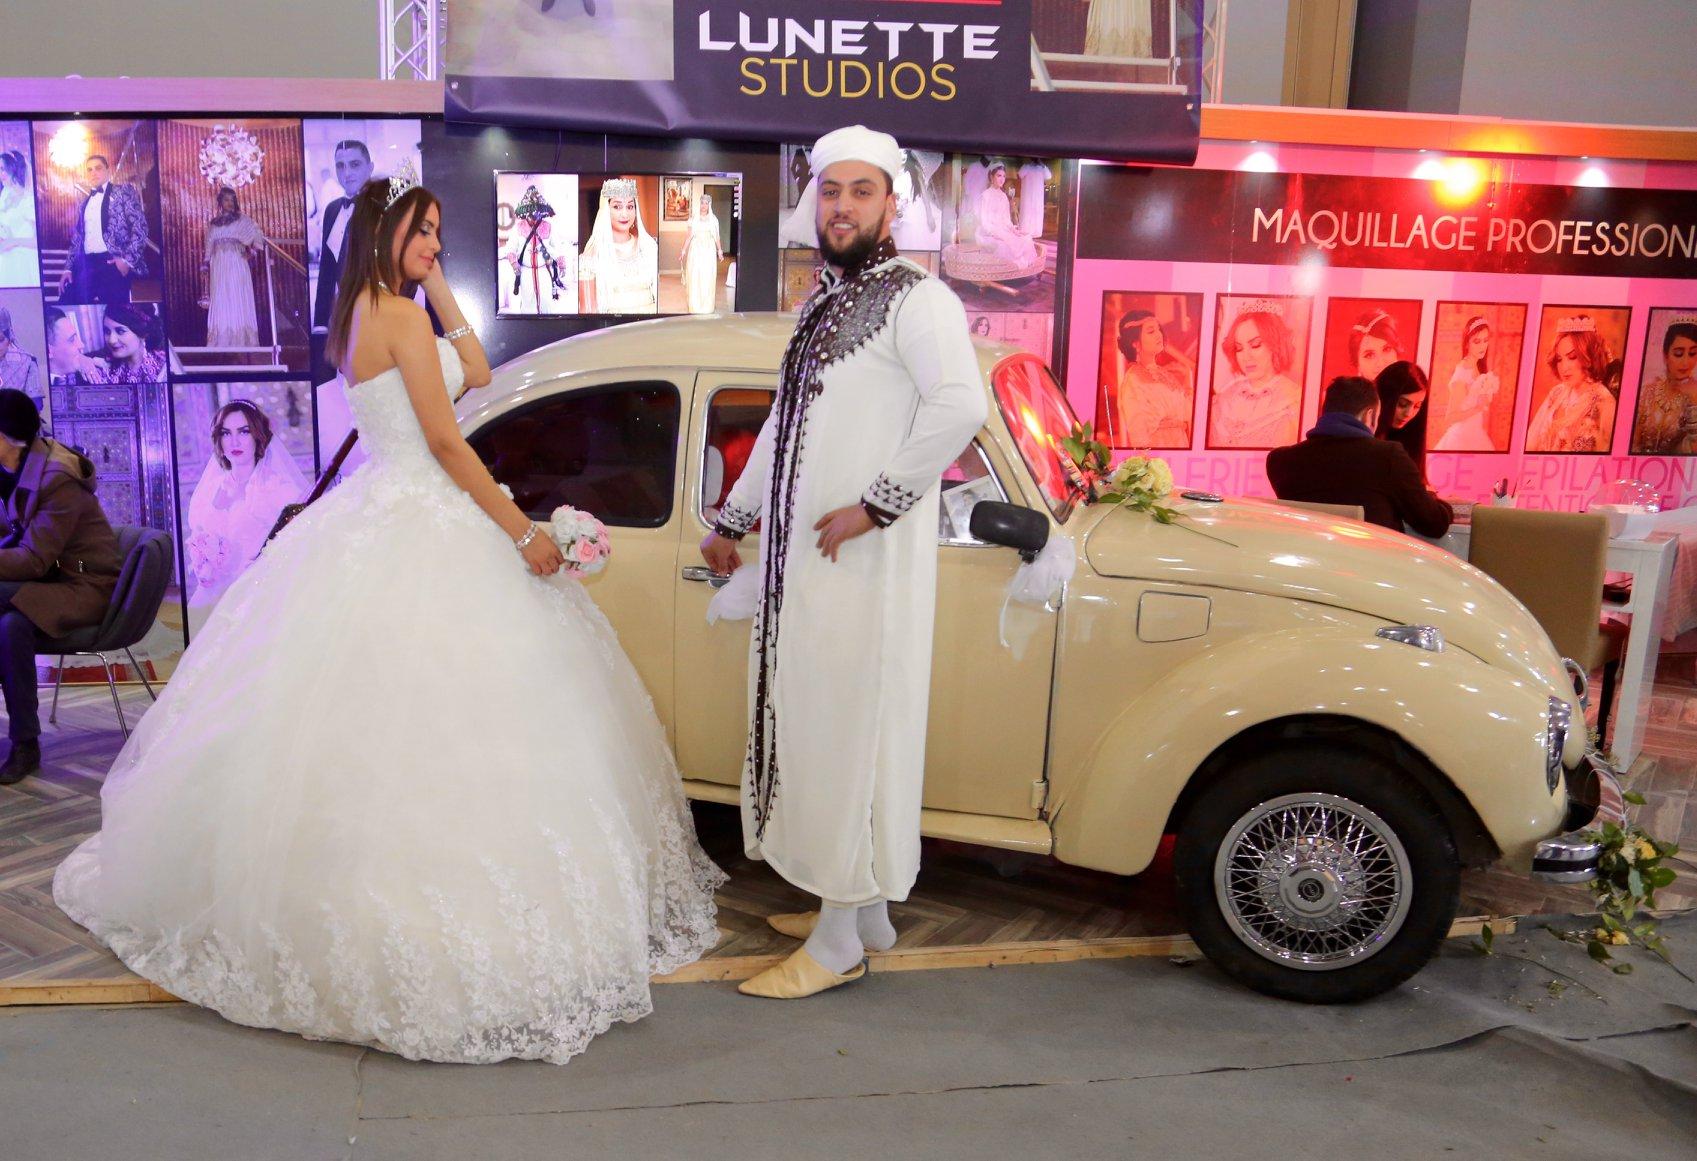 Lunette Studios, Oran à Alger